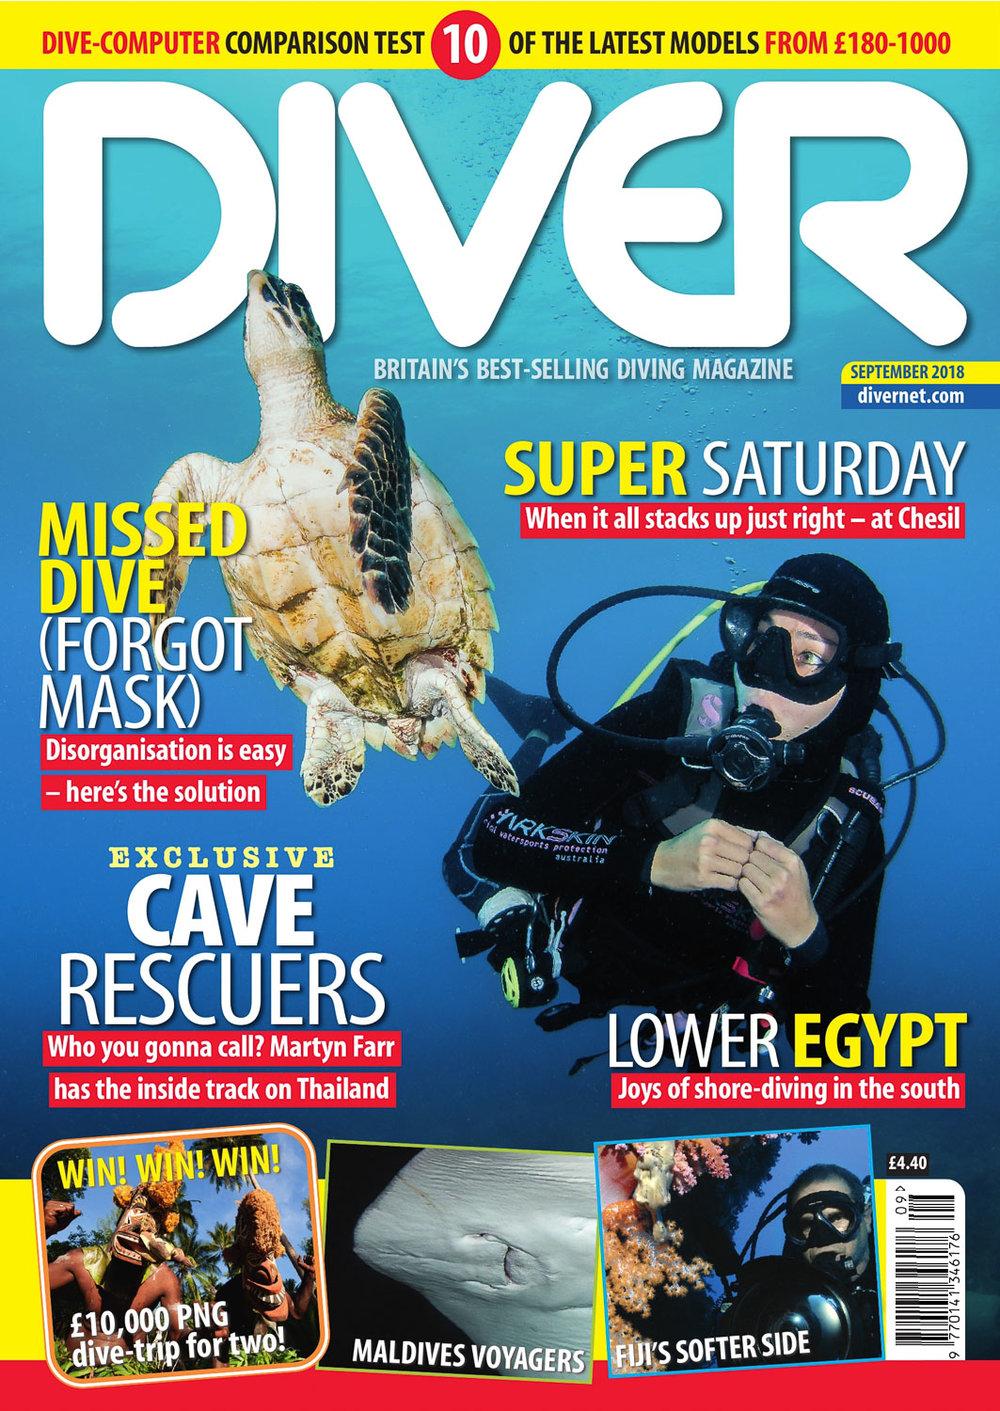 Front Cover DIVER magazine - September 2018